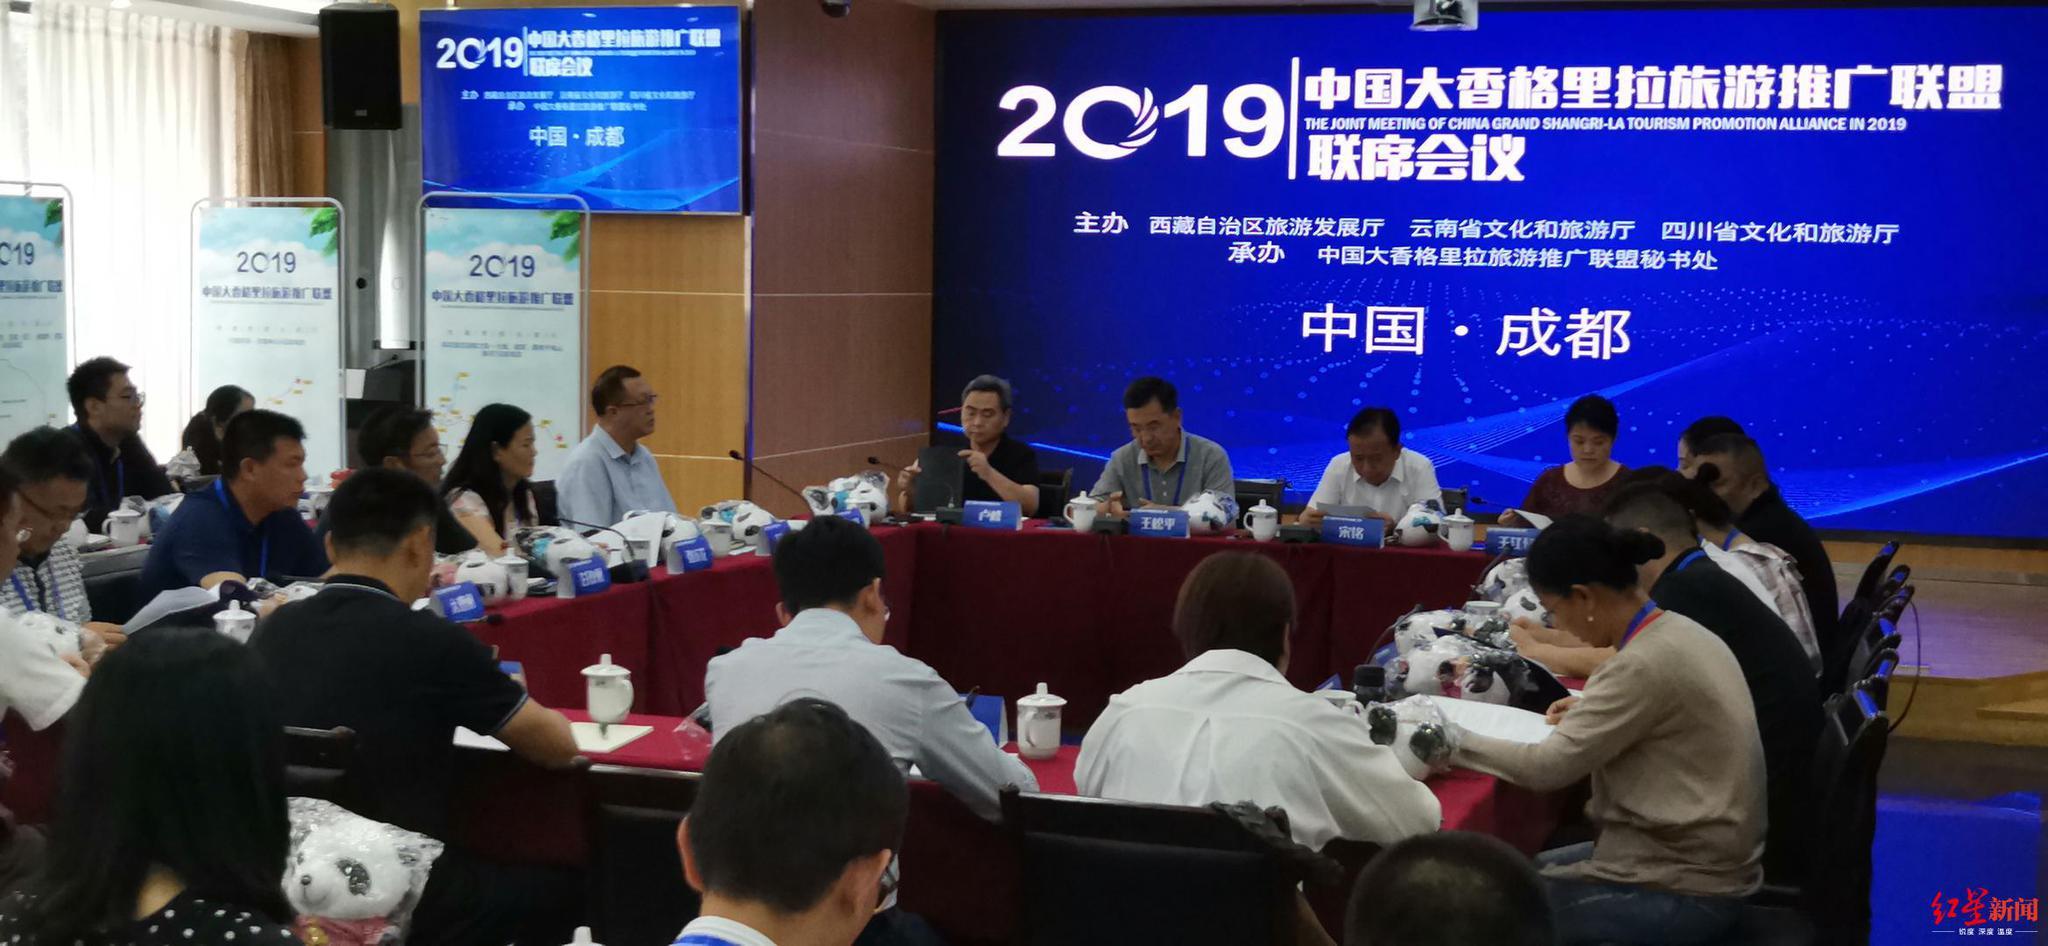 http://www.weixinrensheng.com/lvyou/455164.html